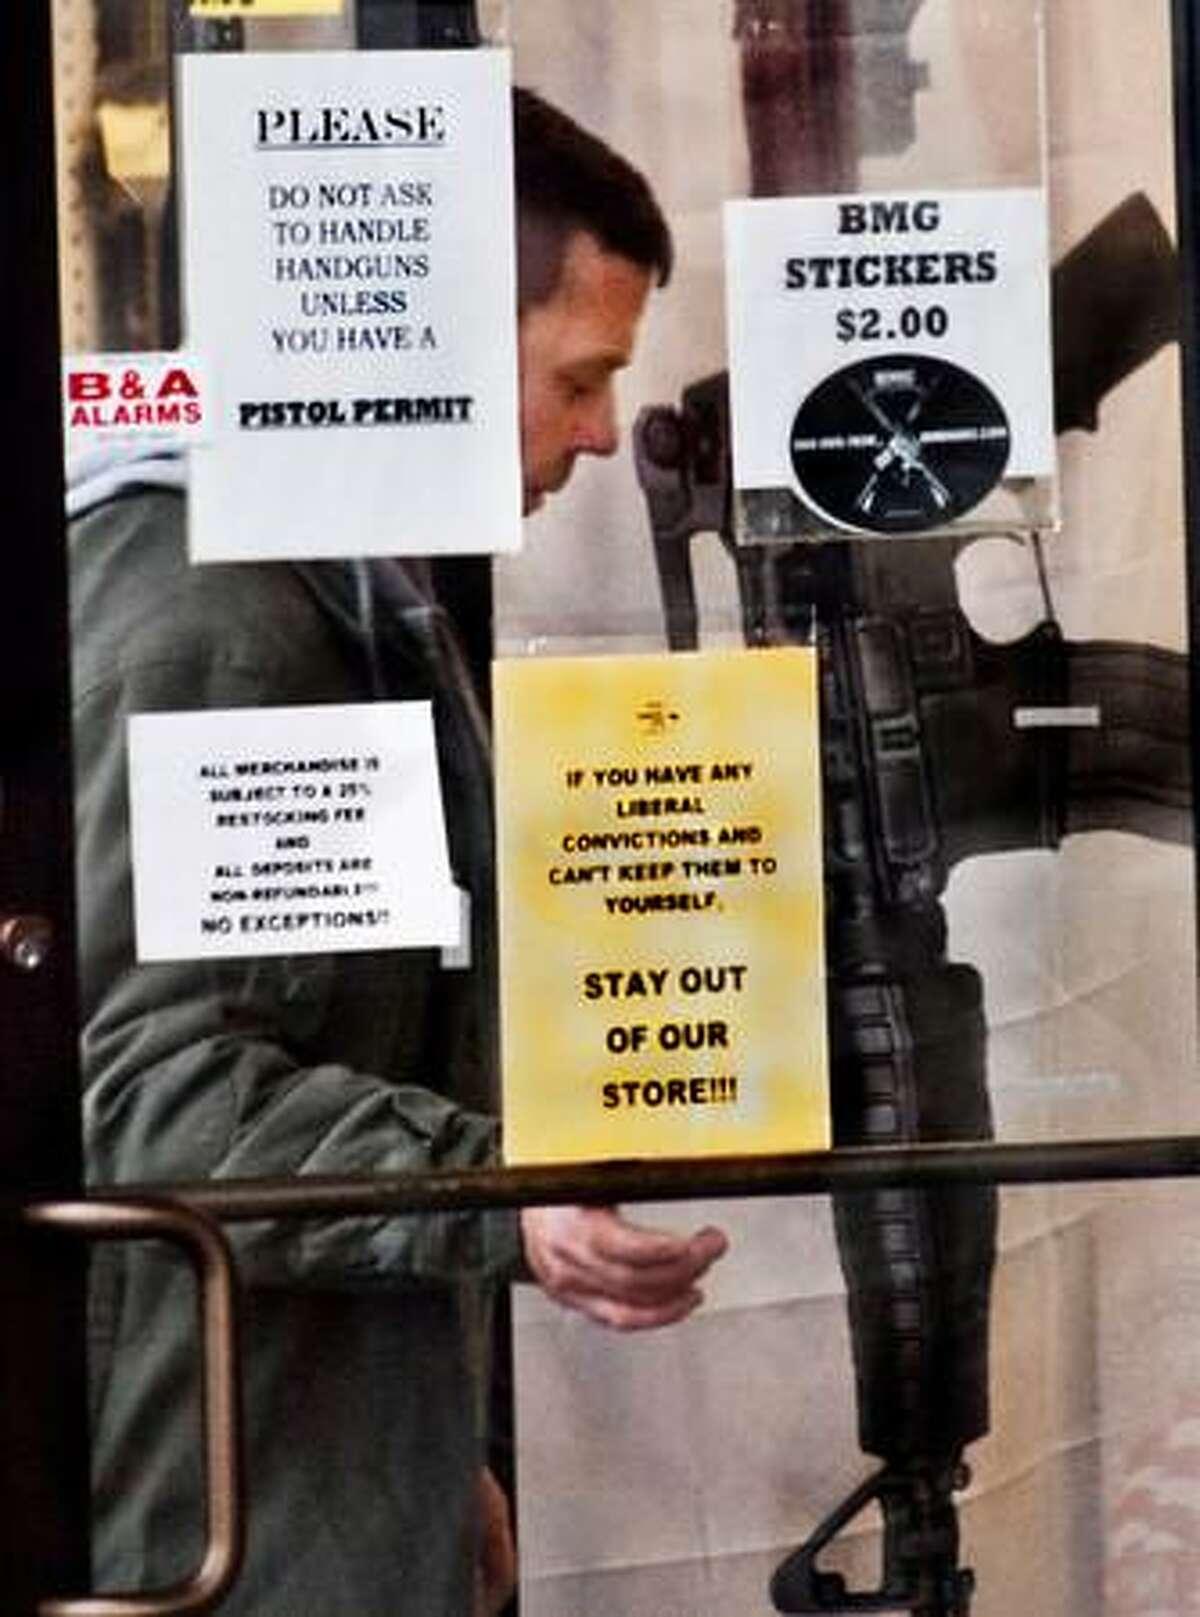 Newington-A man walks into BMG gun shop, in Newington. Melanie Stengel/Register